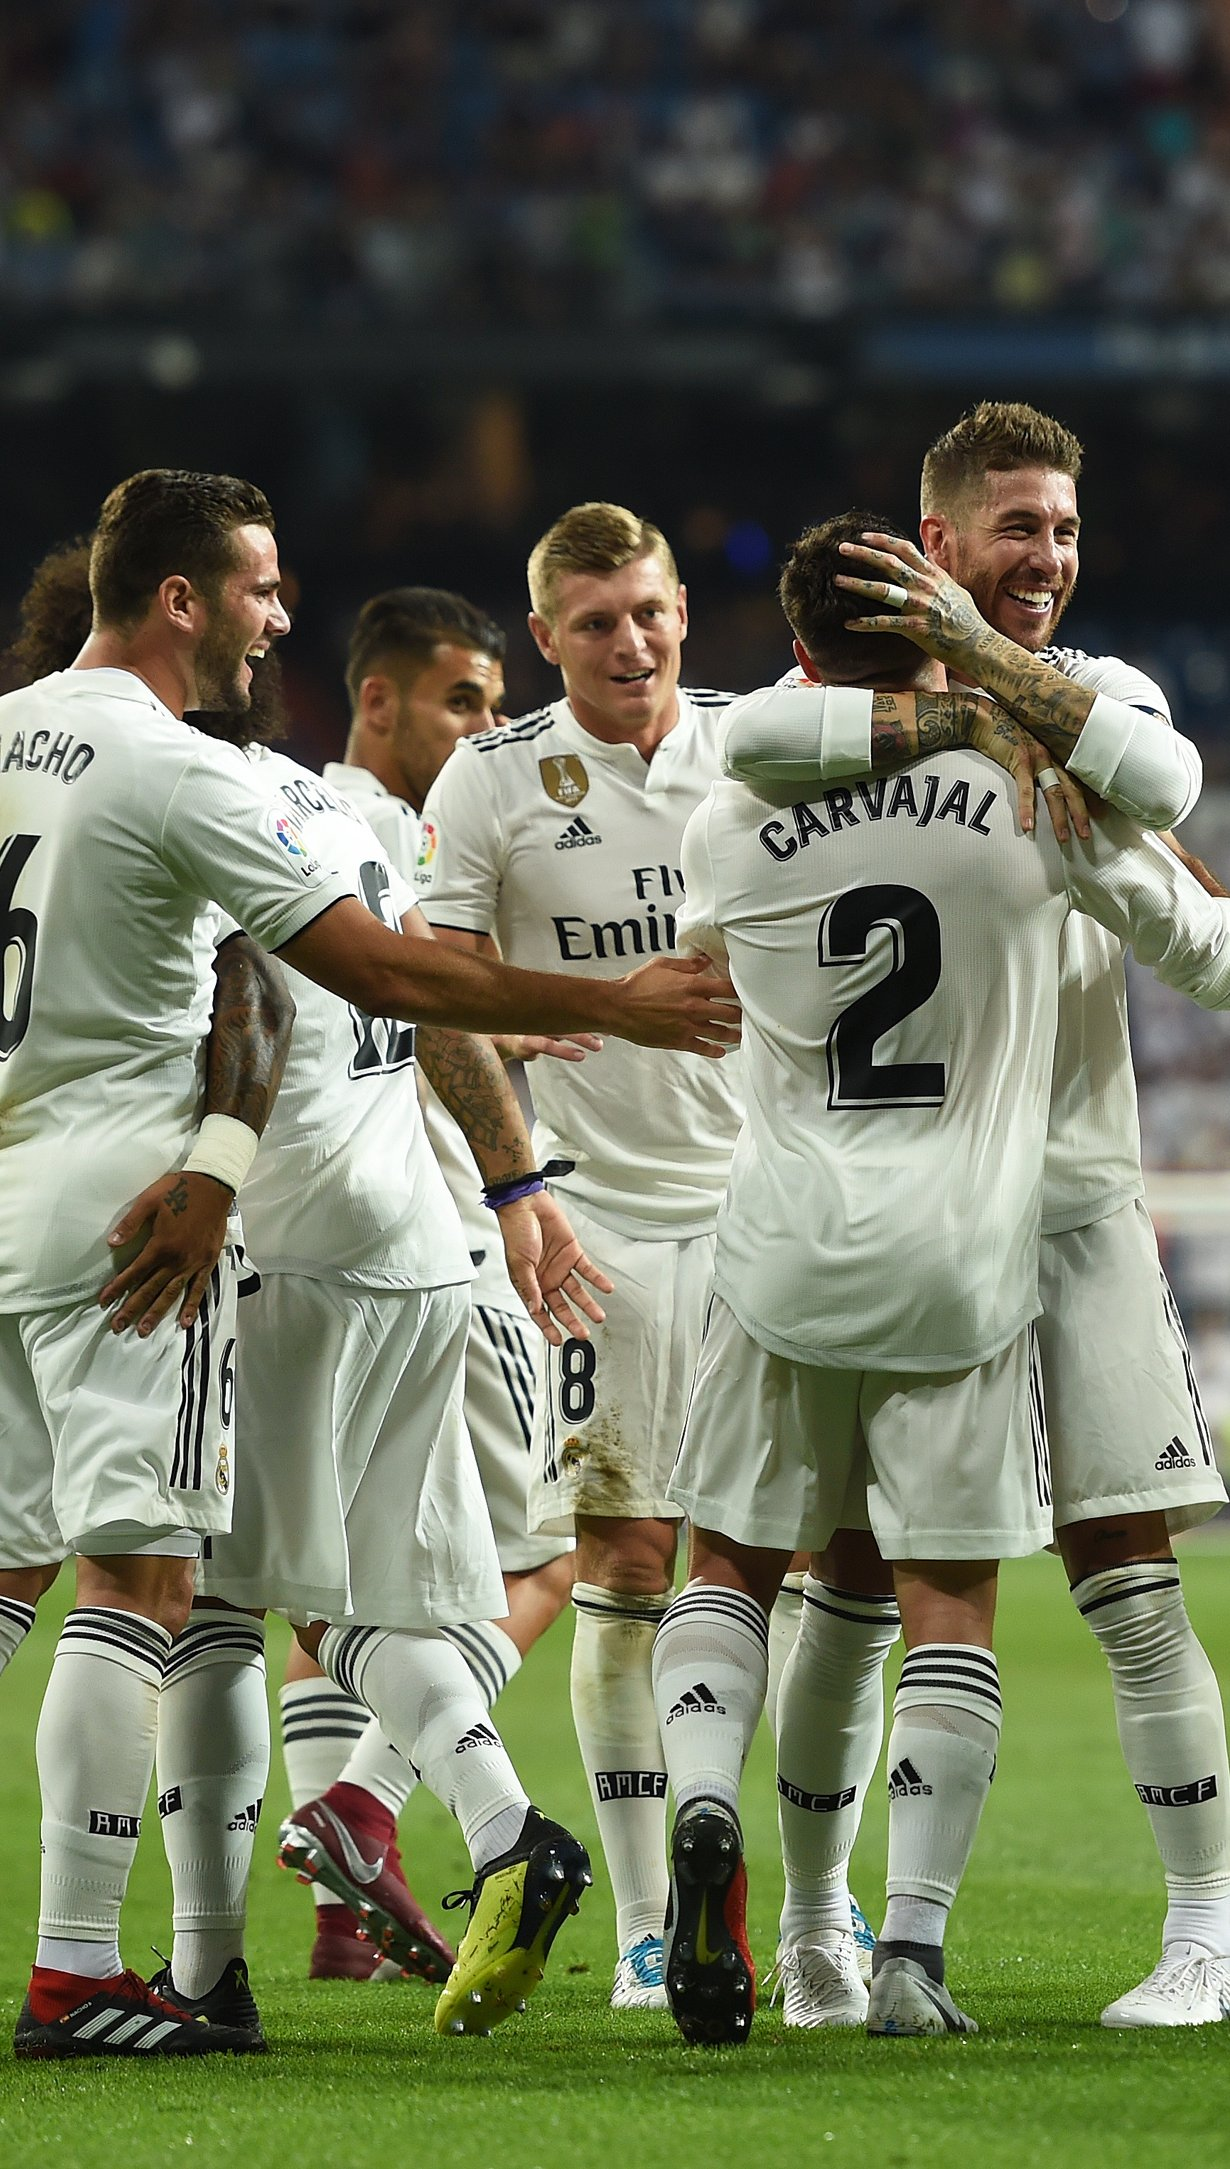 Fondos de pantalla Real Madrid celebrando gol Vertical